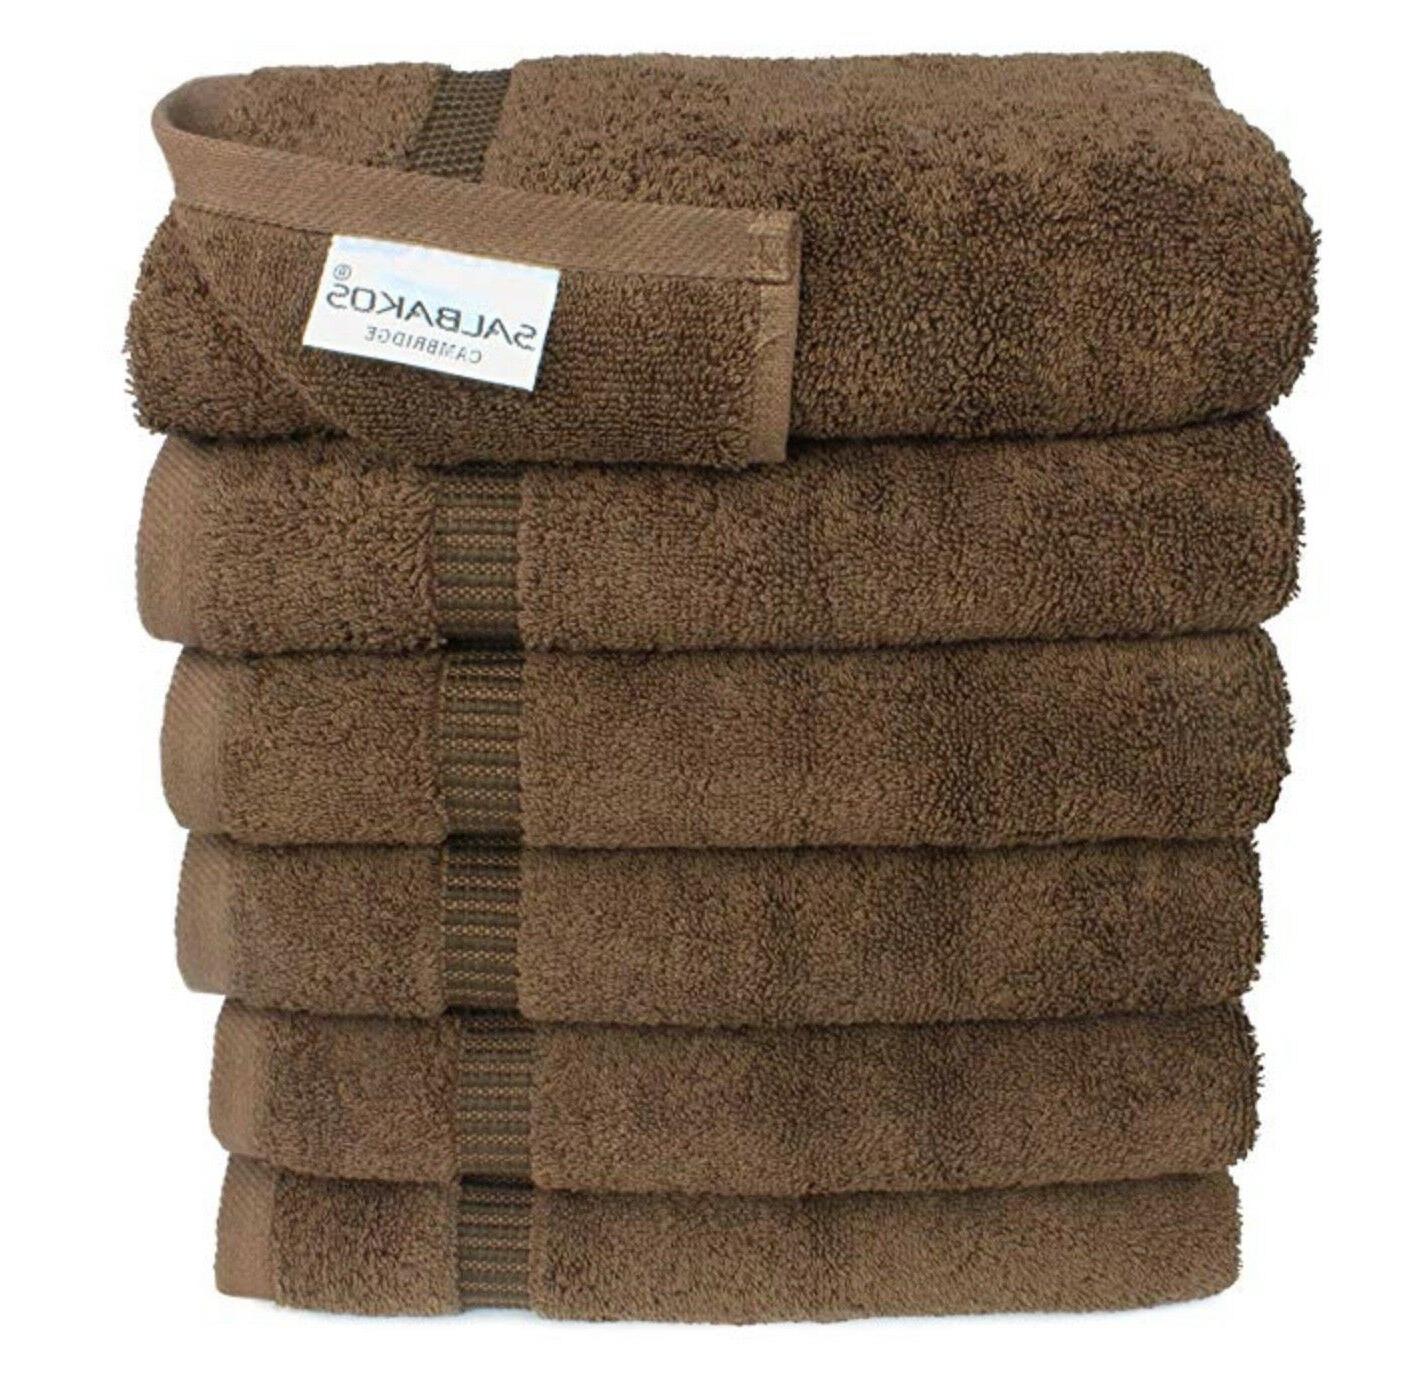 "Turkish Luxury Hotel & Spa 16""x30"" Hand Set of 6 Organic Towels"